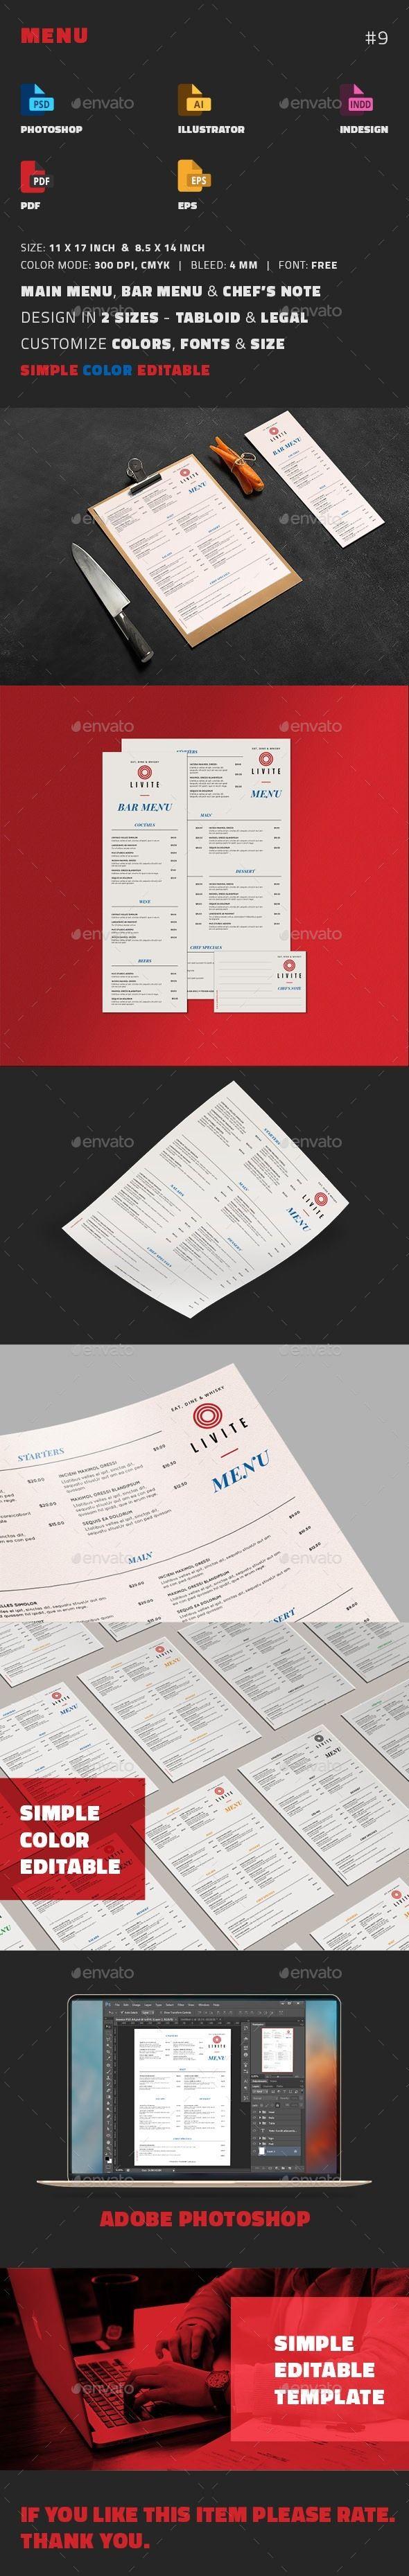 Mejores 1765 imágenes de Restaurant Menu Design en Pinterest ...